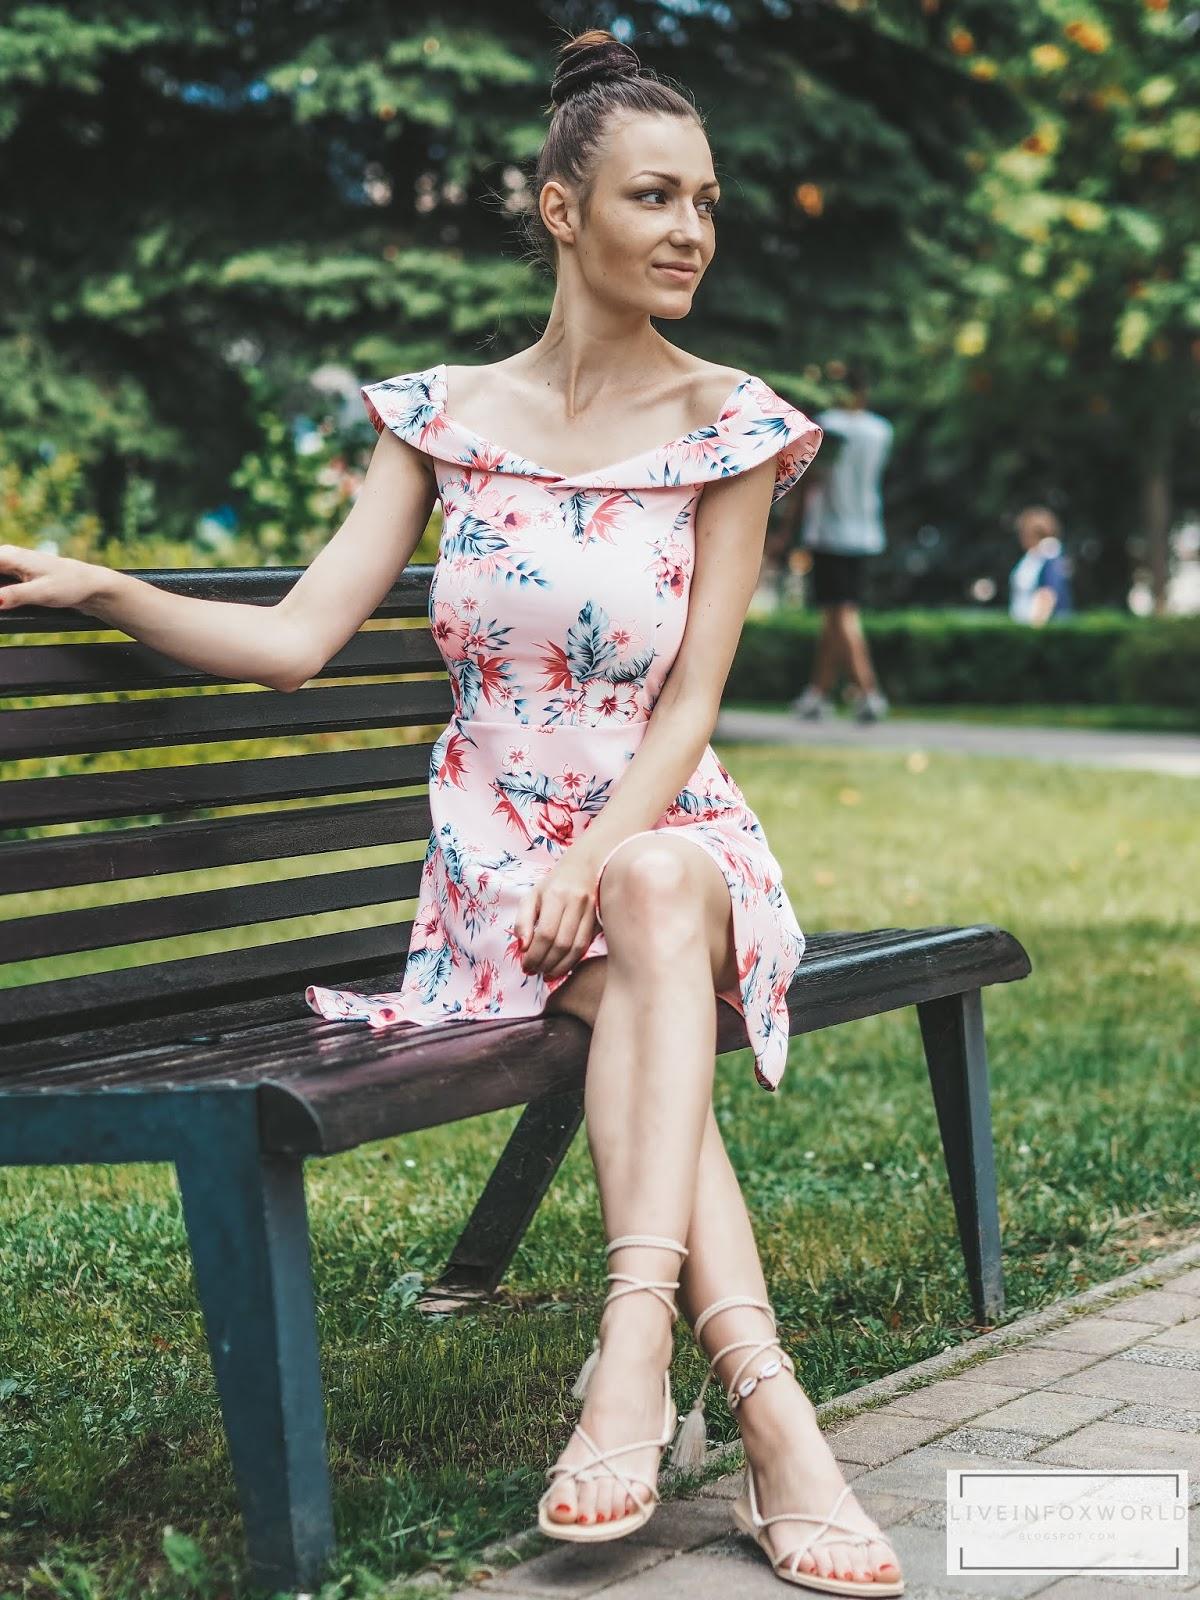 šaty carmen z bonprix s kvetinovou potlačou